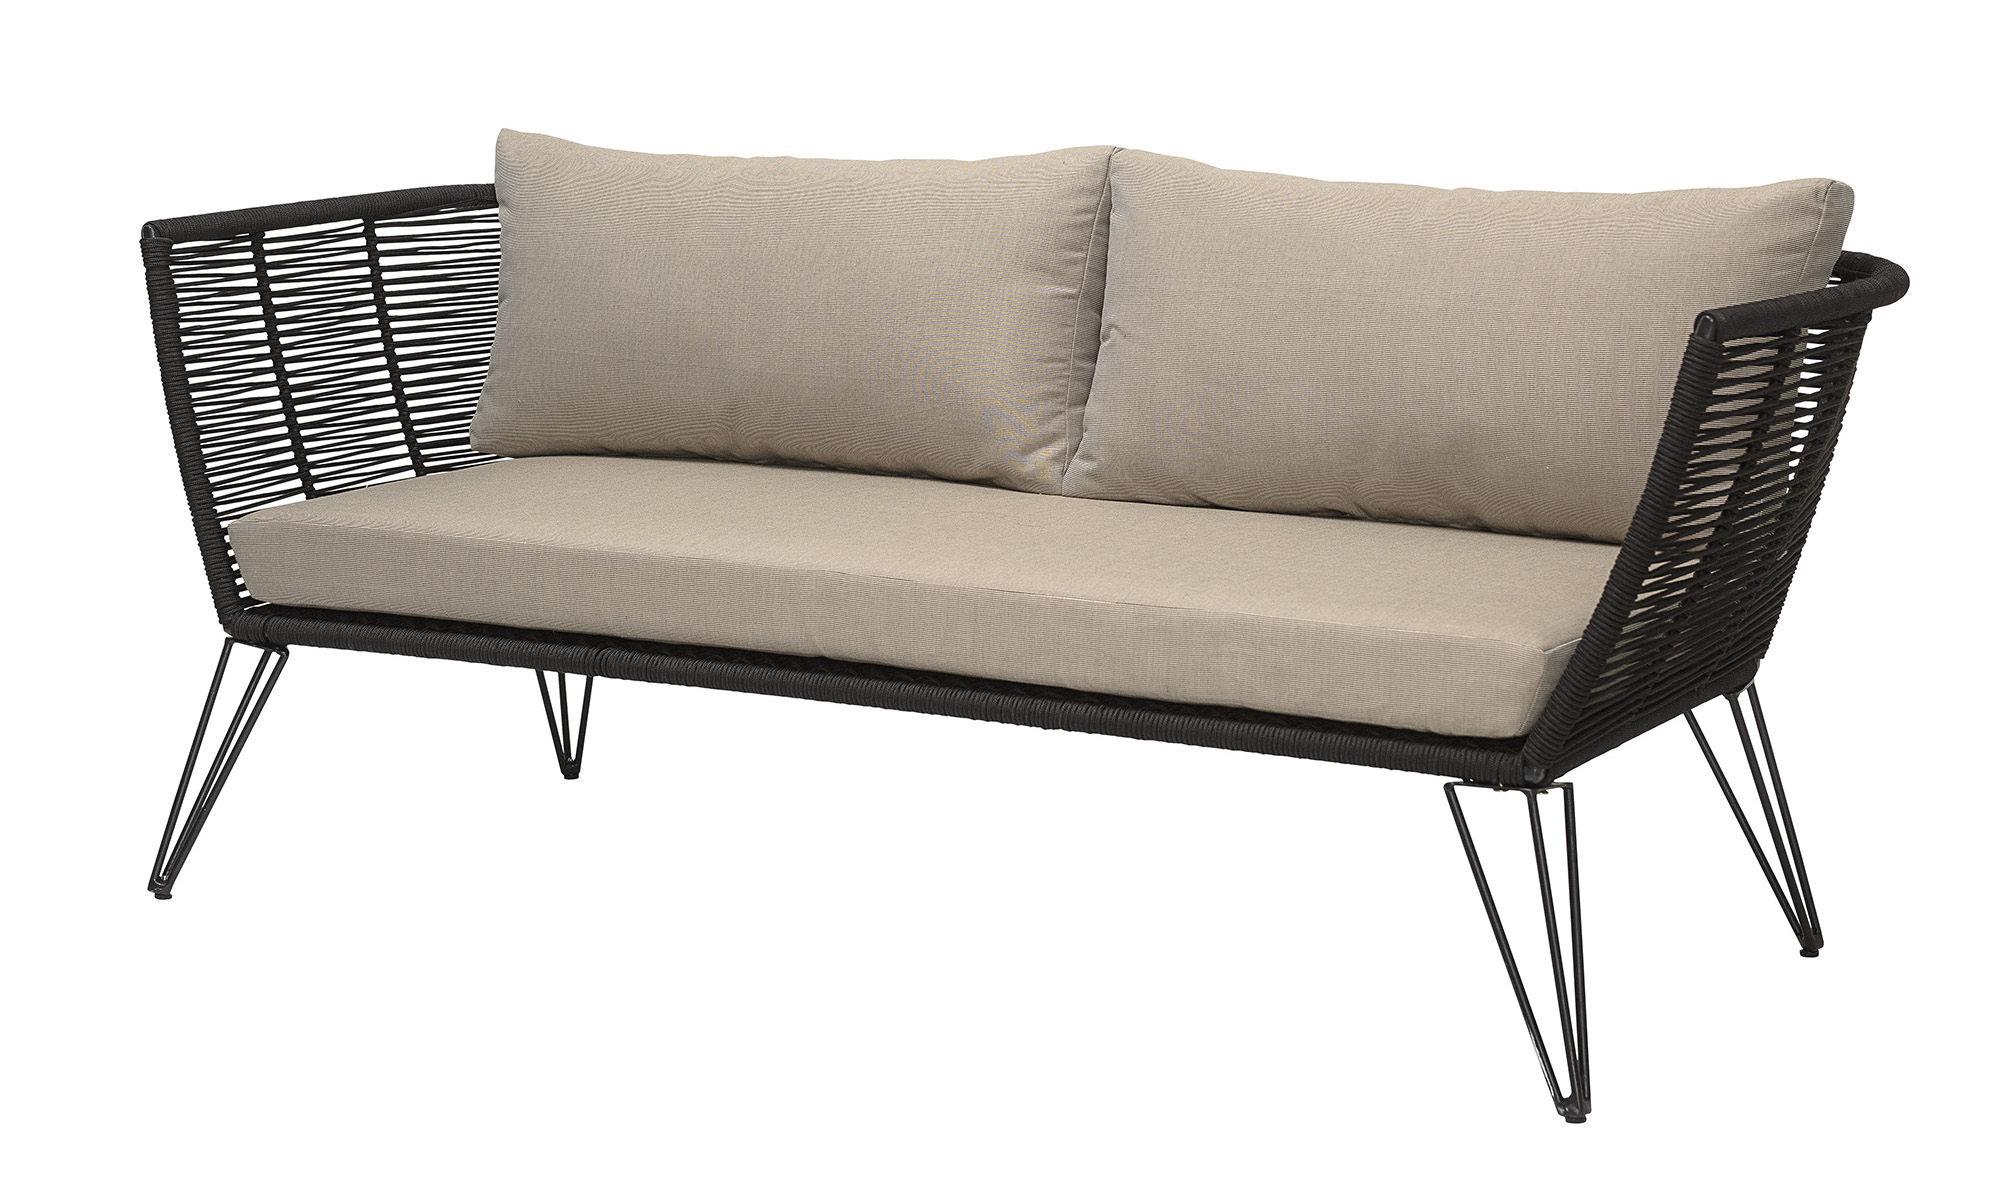 Metal straight sofa l 175 cm indoors outdoors bloomingville